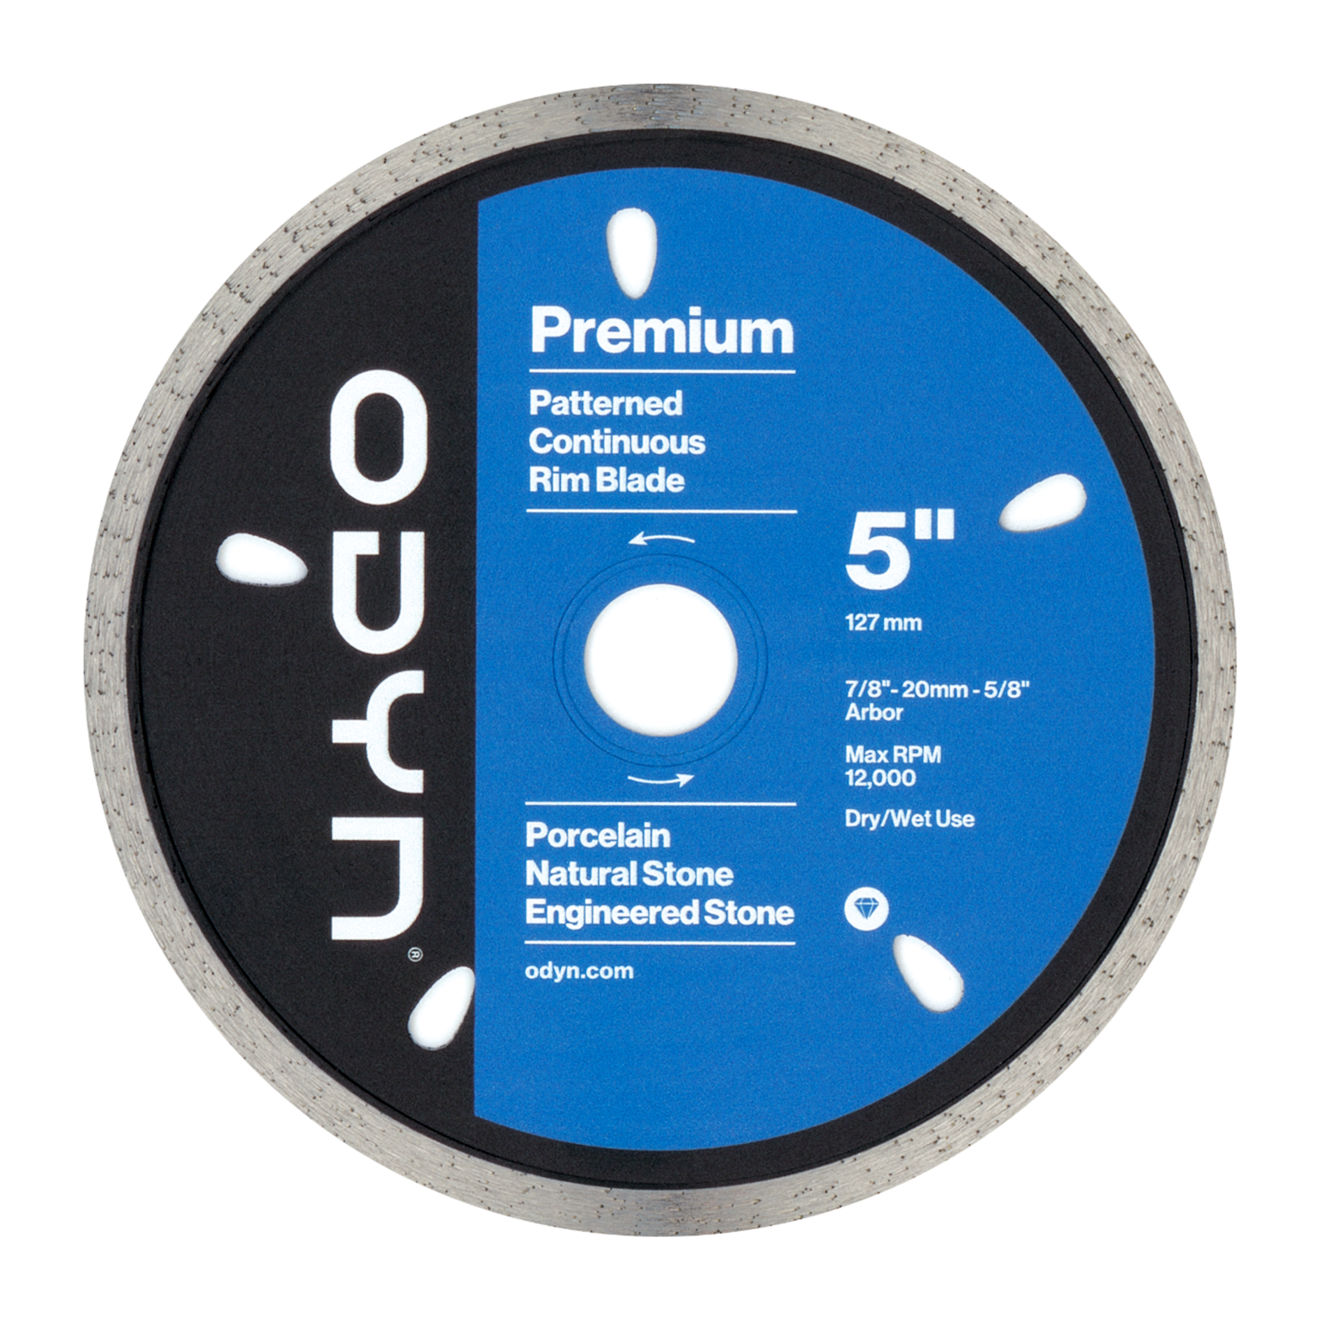 Odyn 5 in. Premium Pattern Continuous Rim Blade